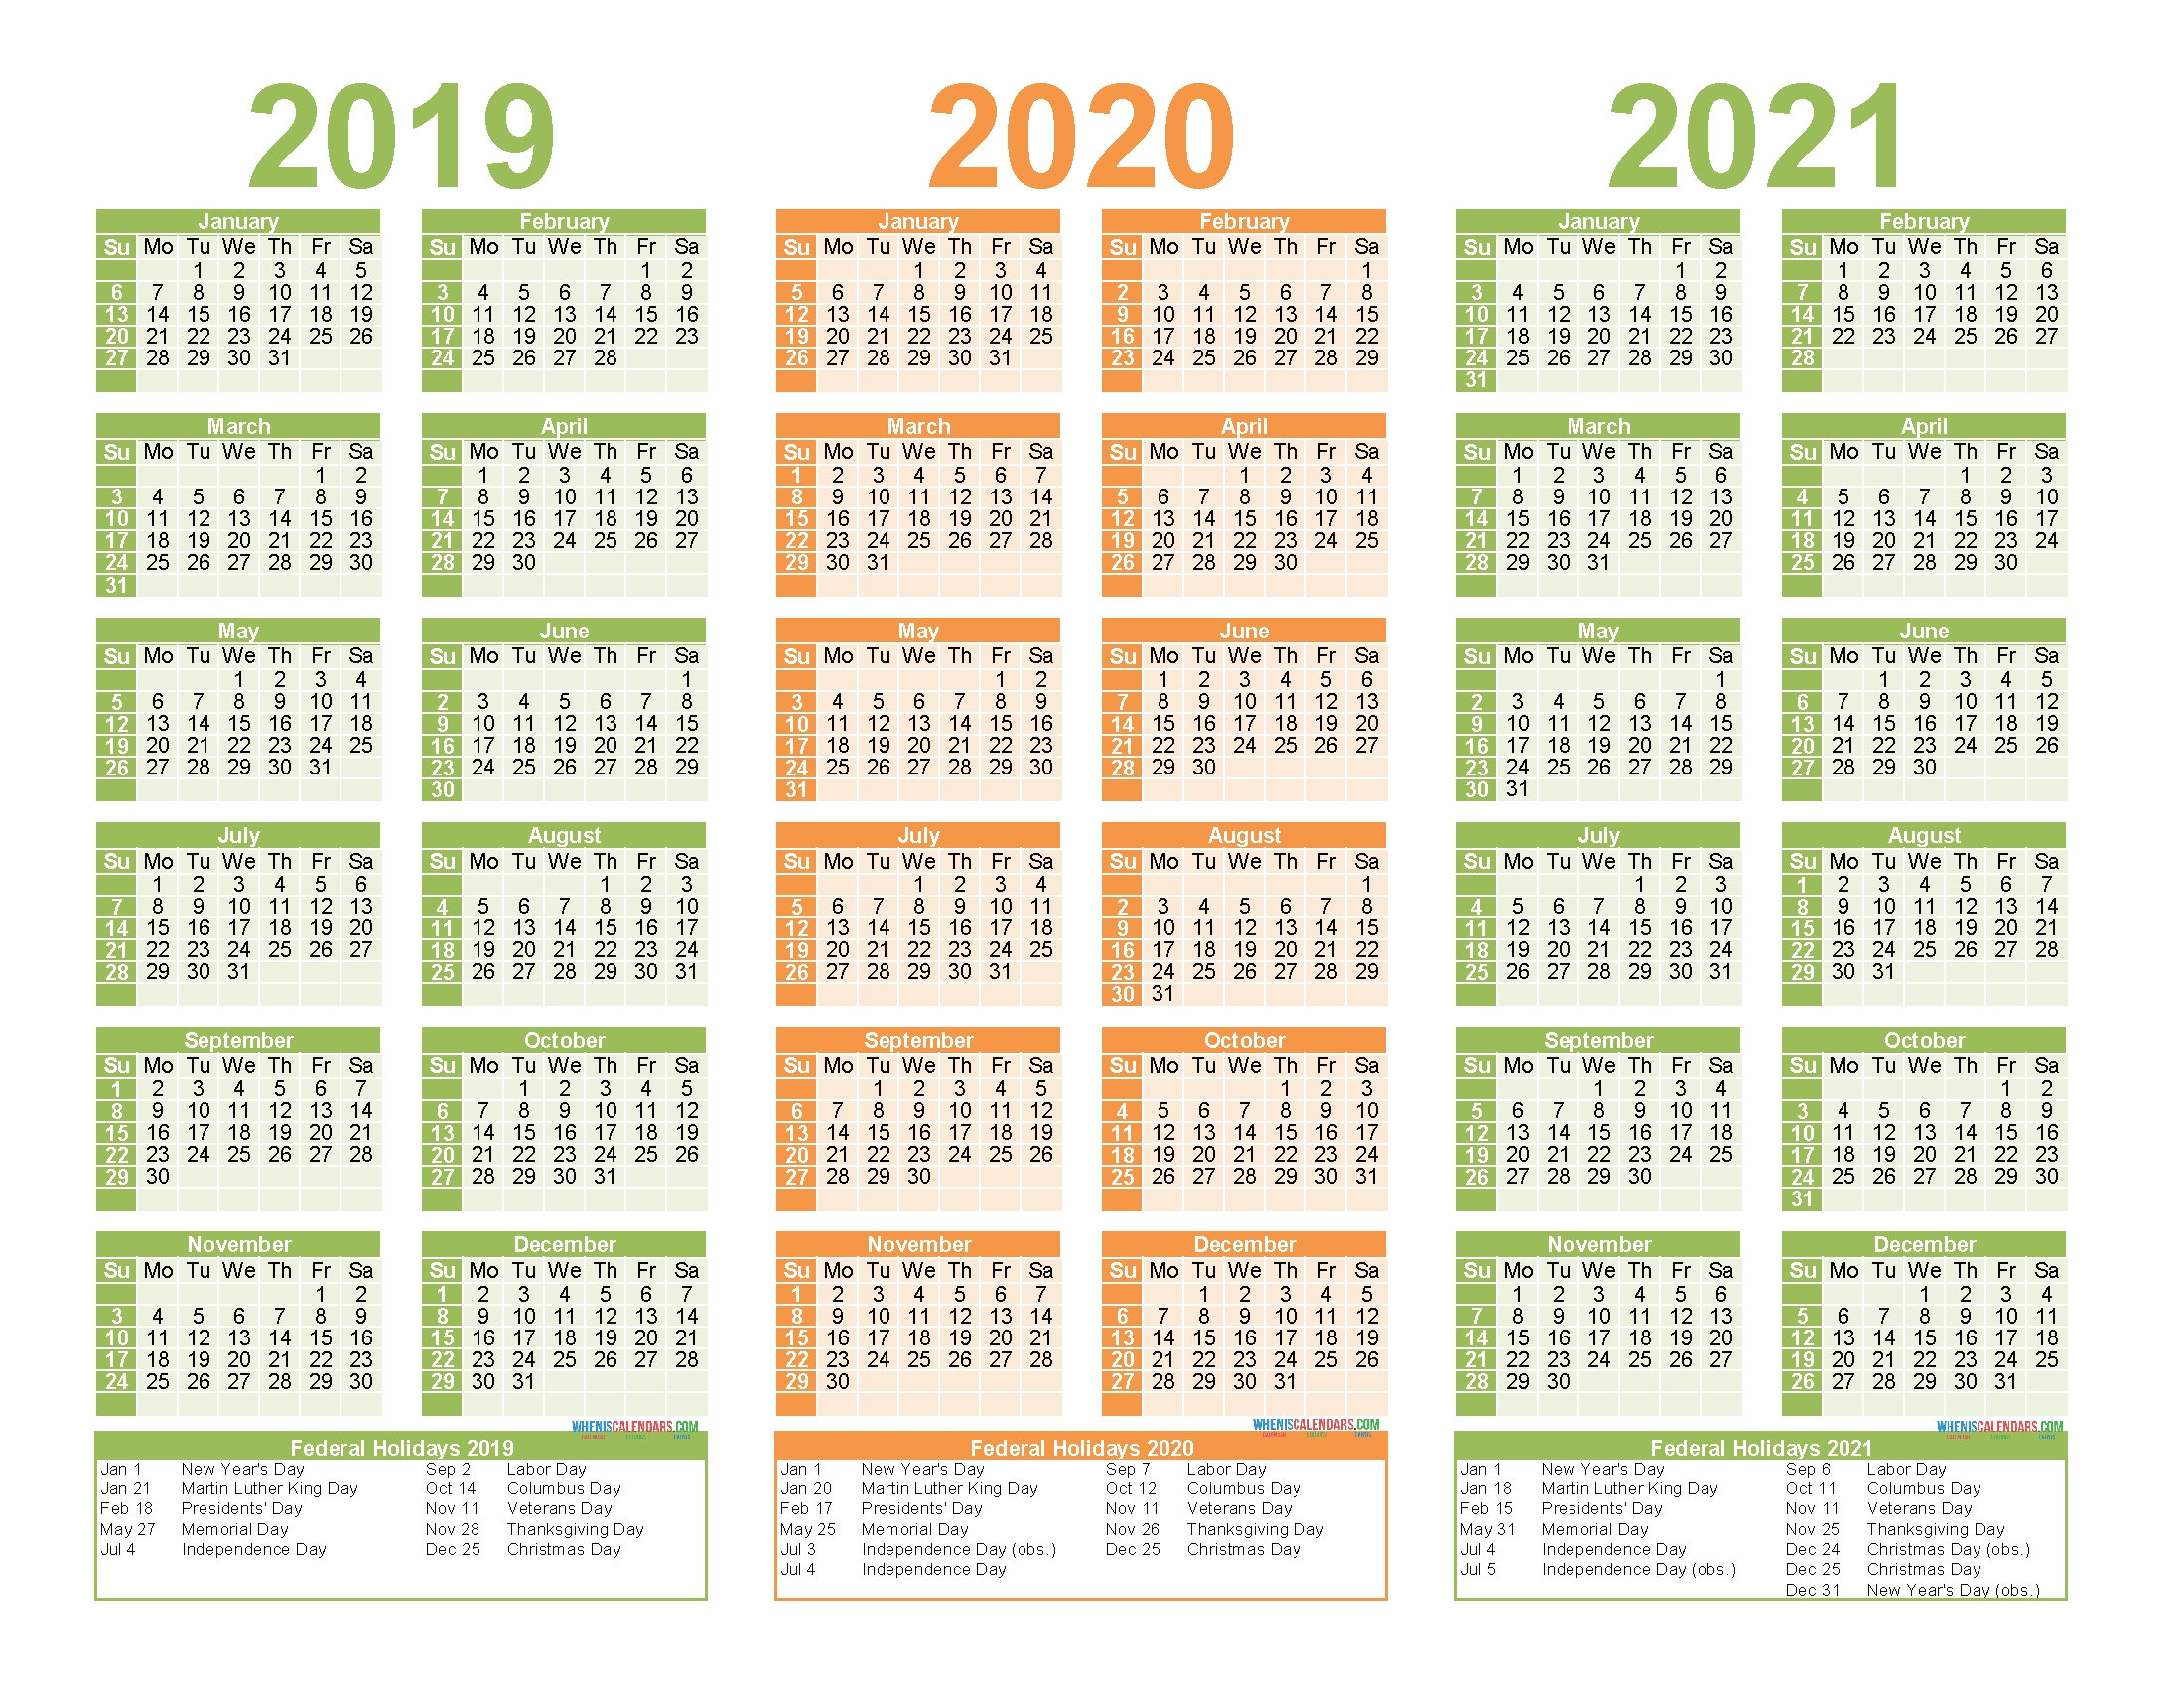 2019 To 2021 Calendar Printable Free Pdf, Word, Image – Free with regard to 3 Year Calendar 2019 2020 2021 Printable